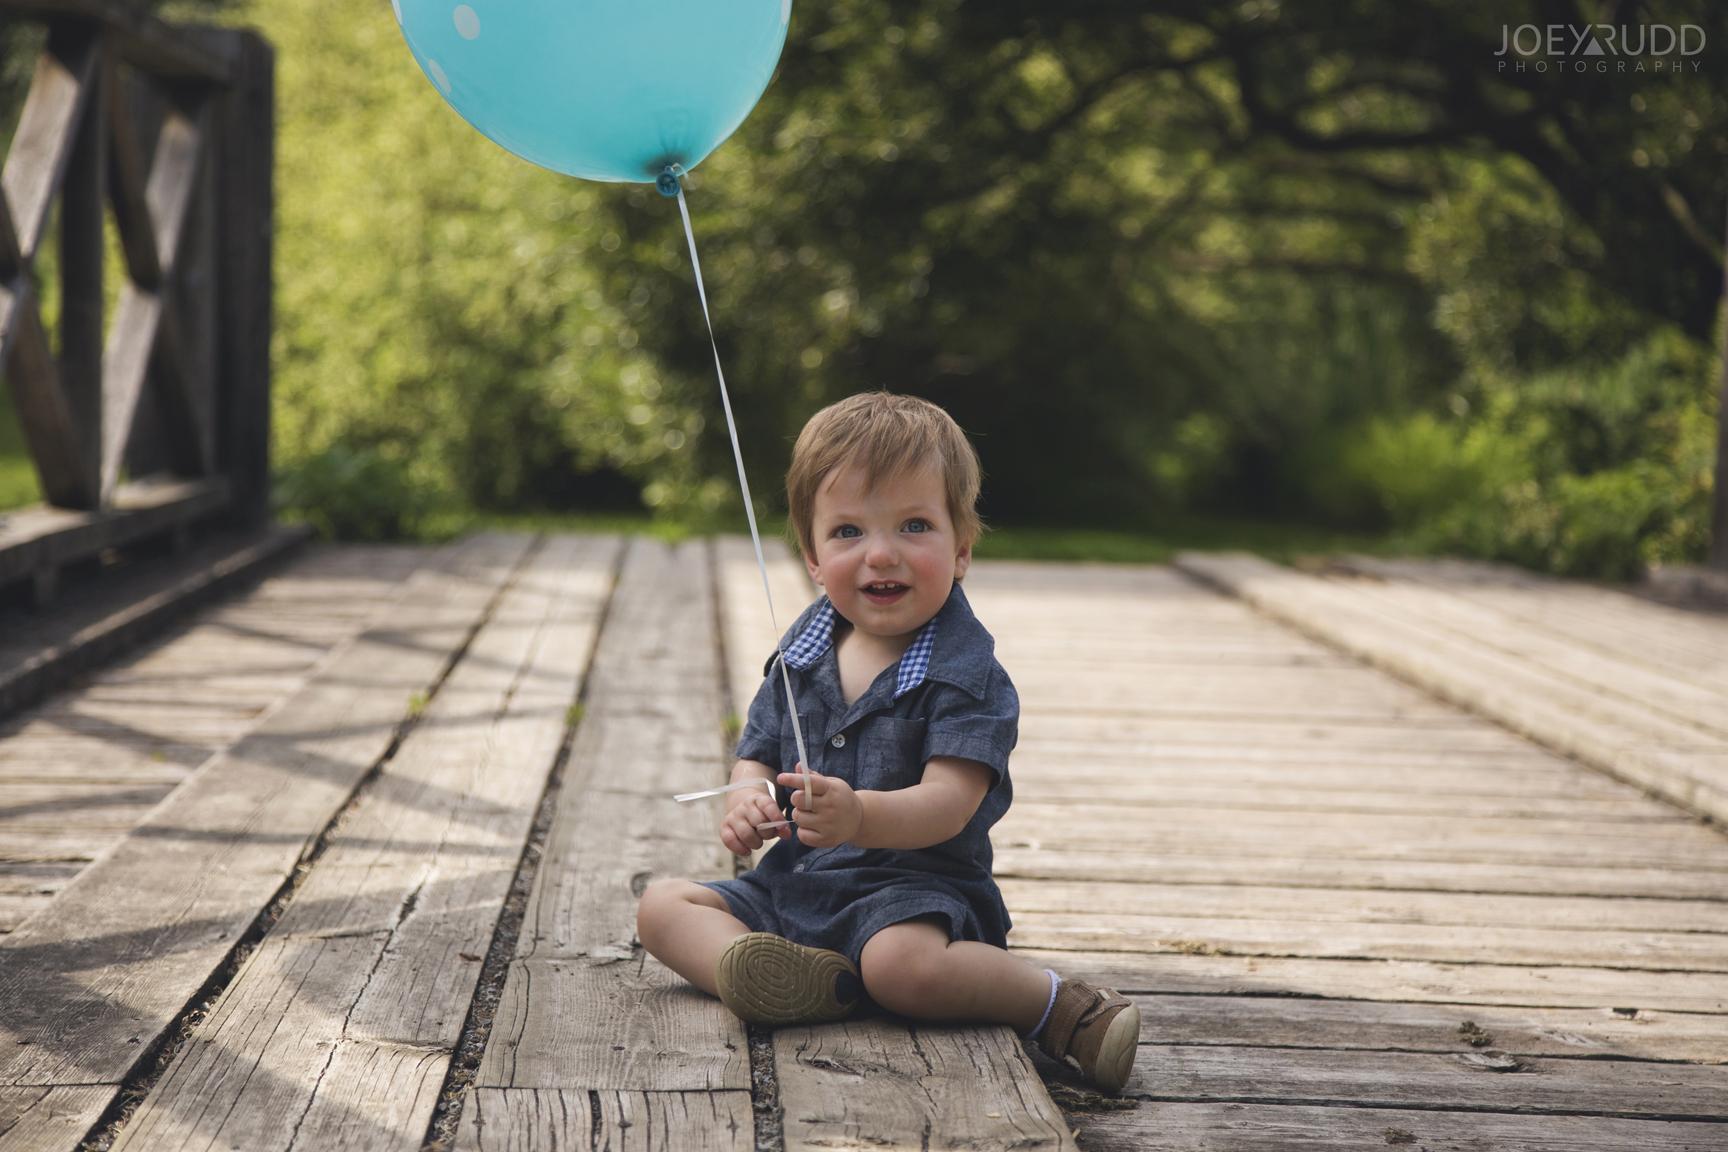 Ottawa Family Photographer Joey Rudd Photography Arboretum Balloon